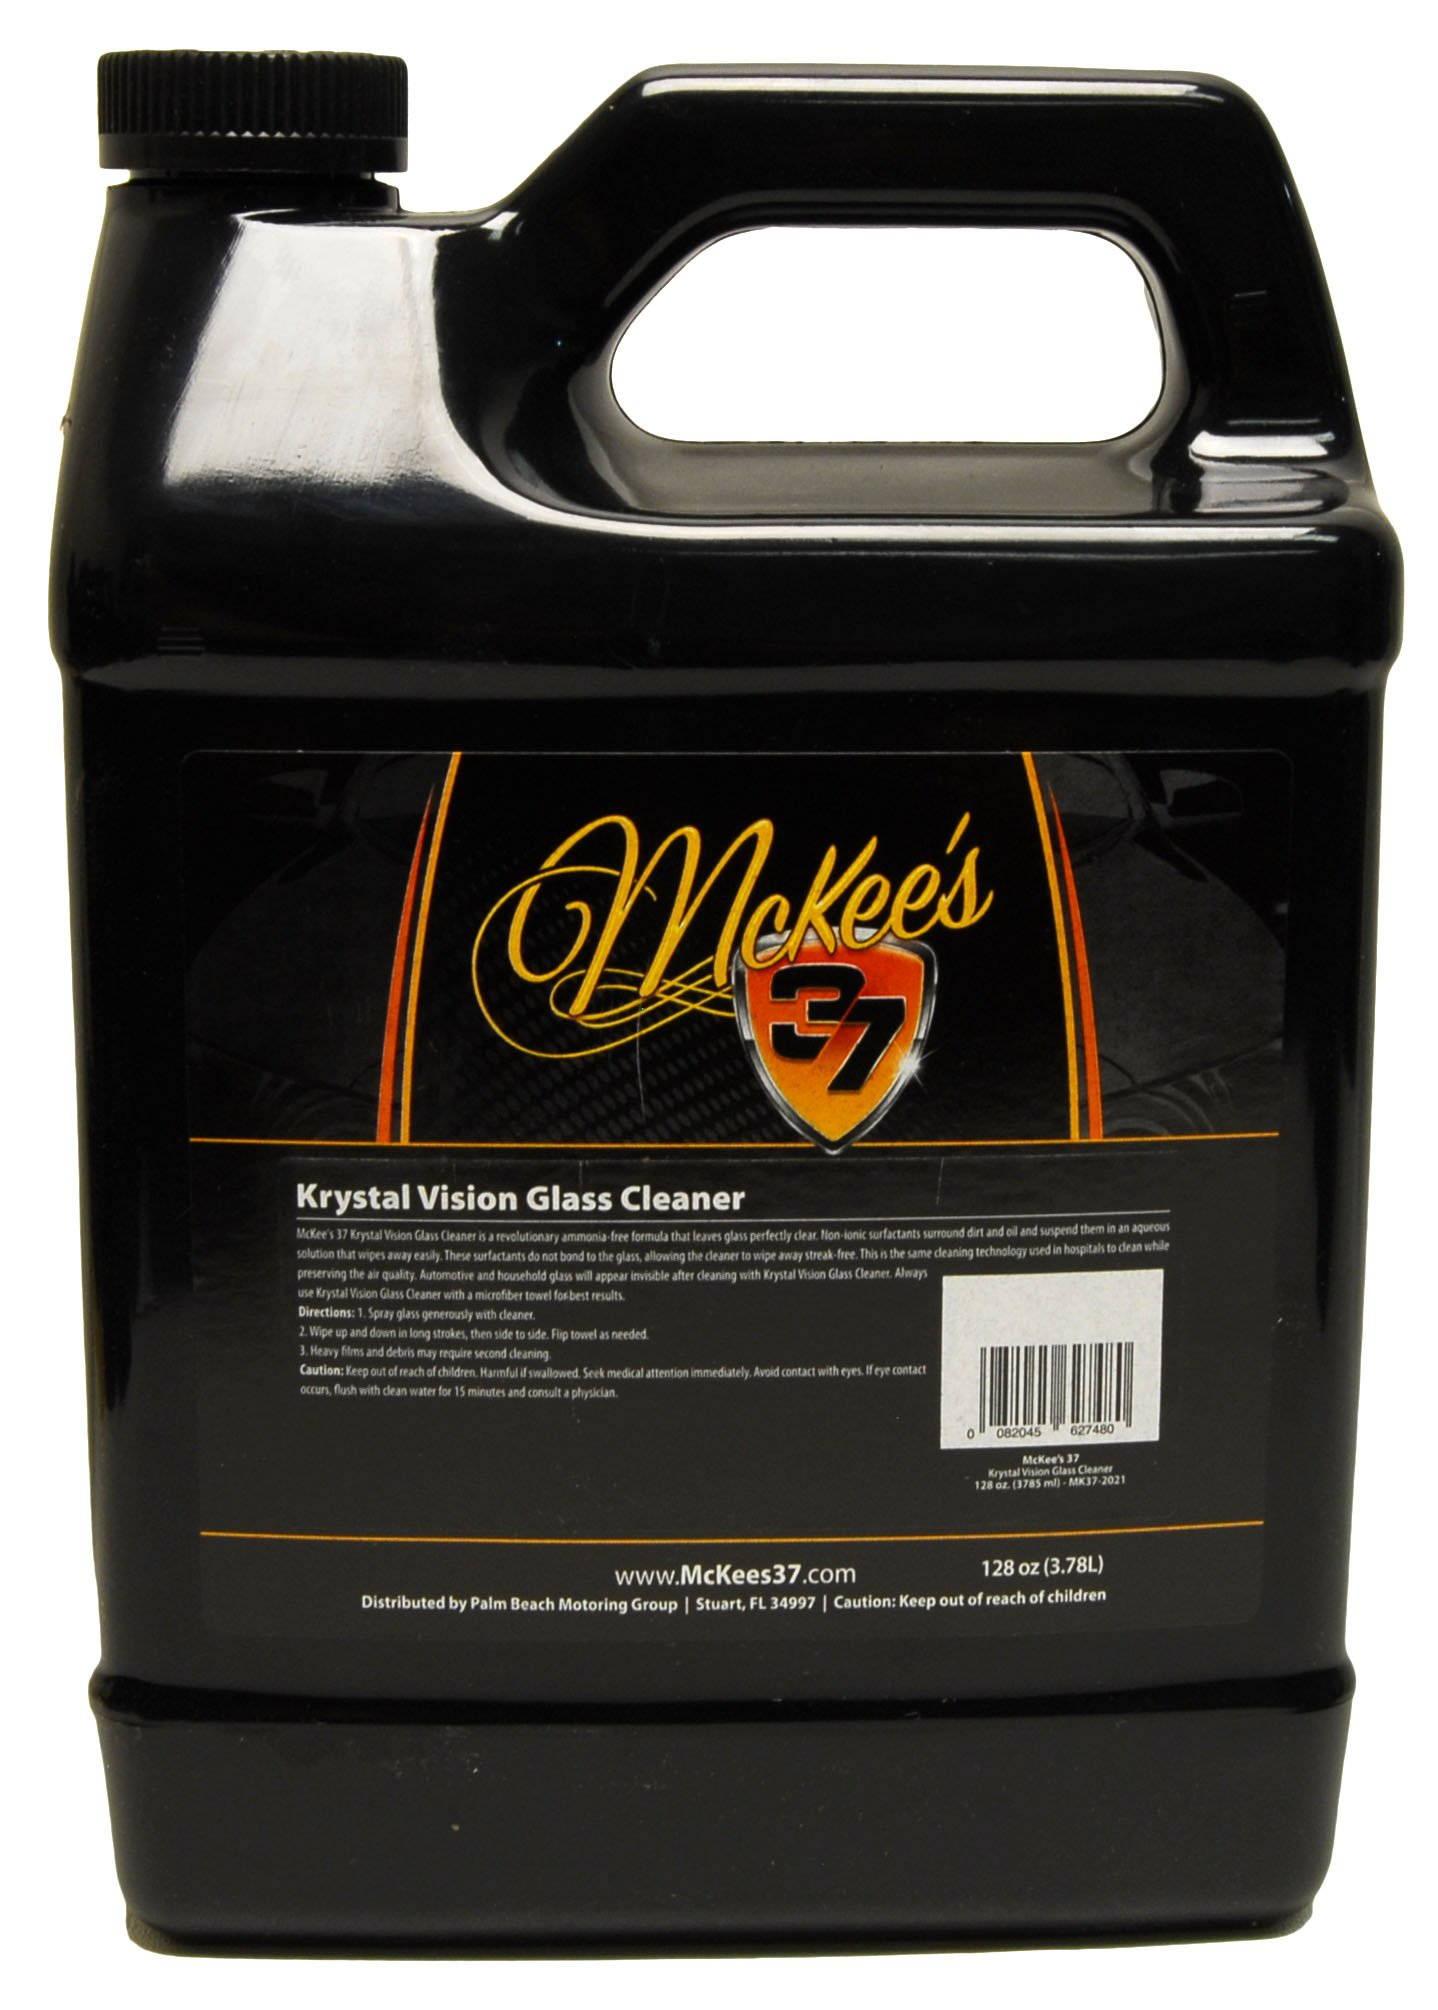 McKee's 37 MK37-2021 Krystal Vision Glass Cleaner 128 Fluid_Ounces by McKee's 37 (Image #1)